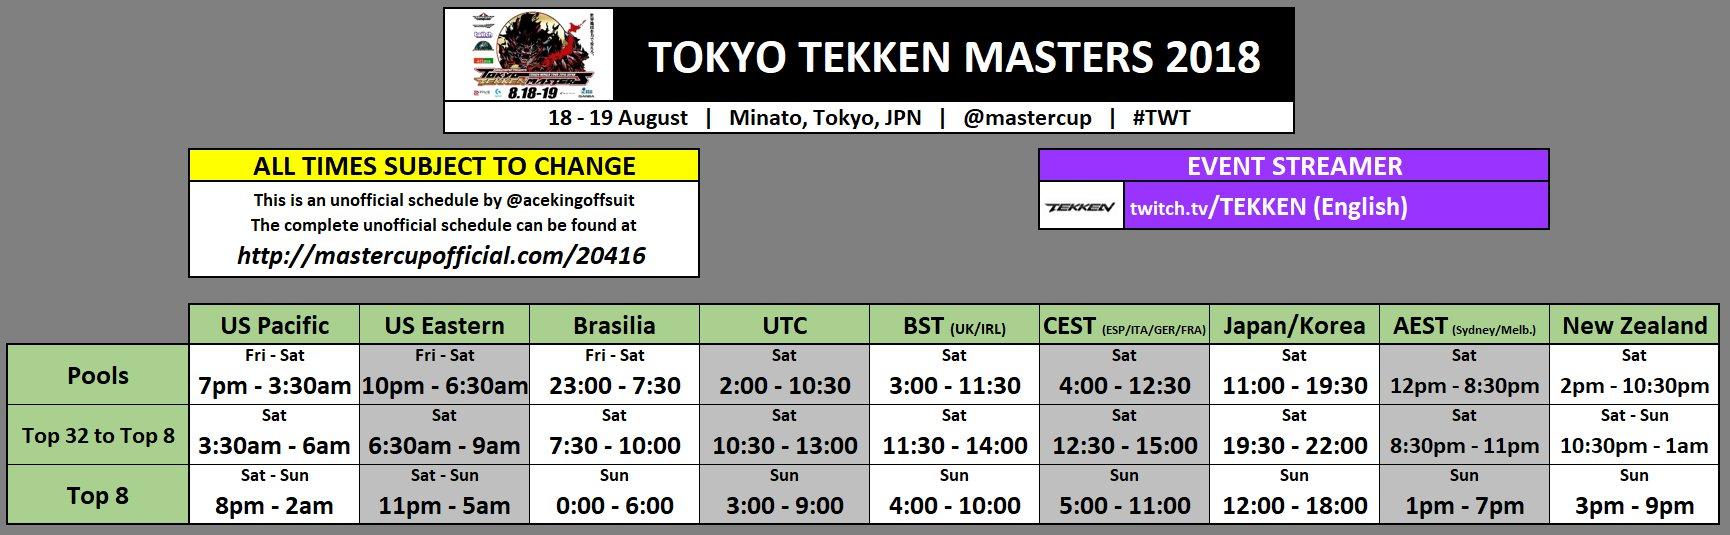 Tokyo Tekken Masters Event Schedule 1 out of 1 image gallery